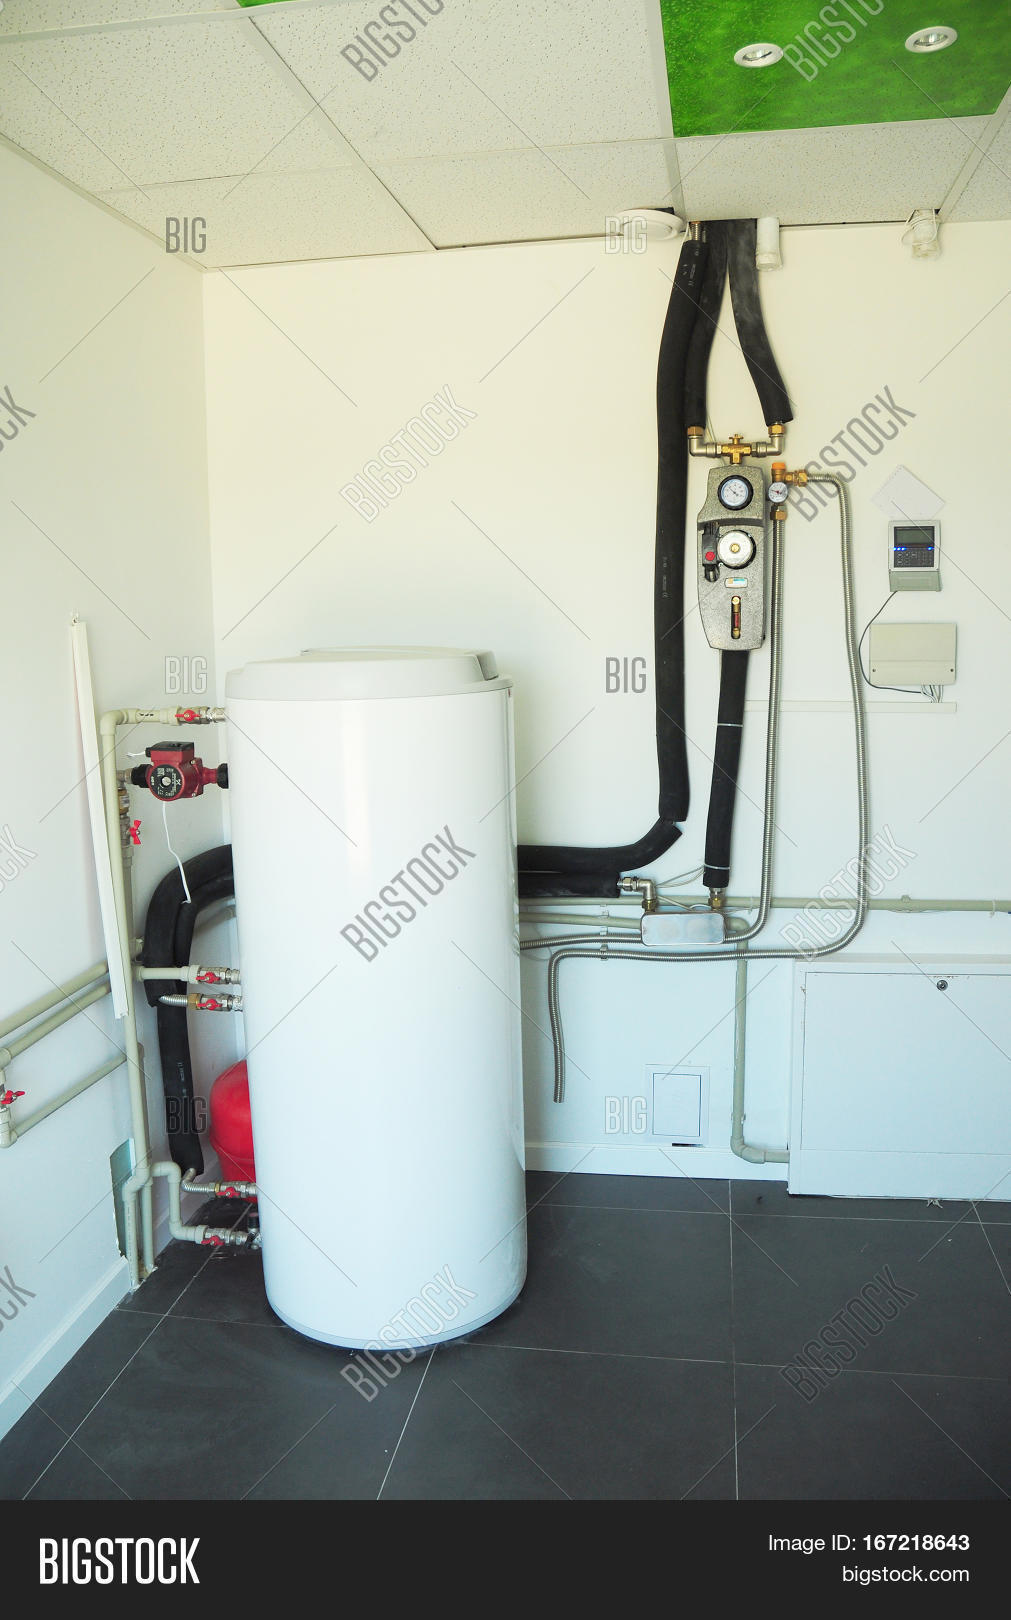 Boiler & Heating Image & Photo (Free Trial) | Bigstock